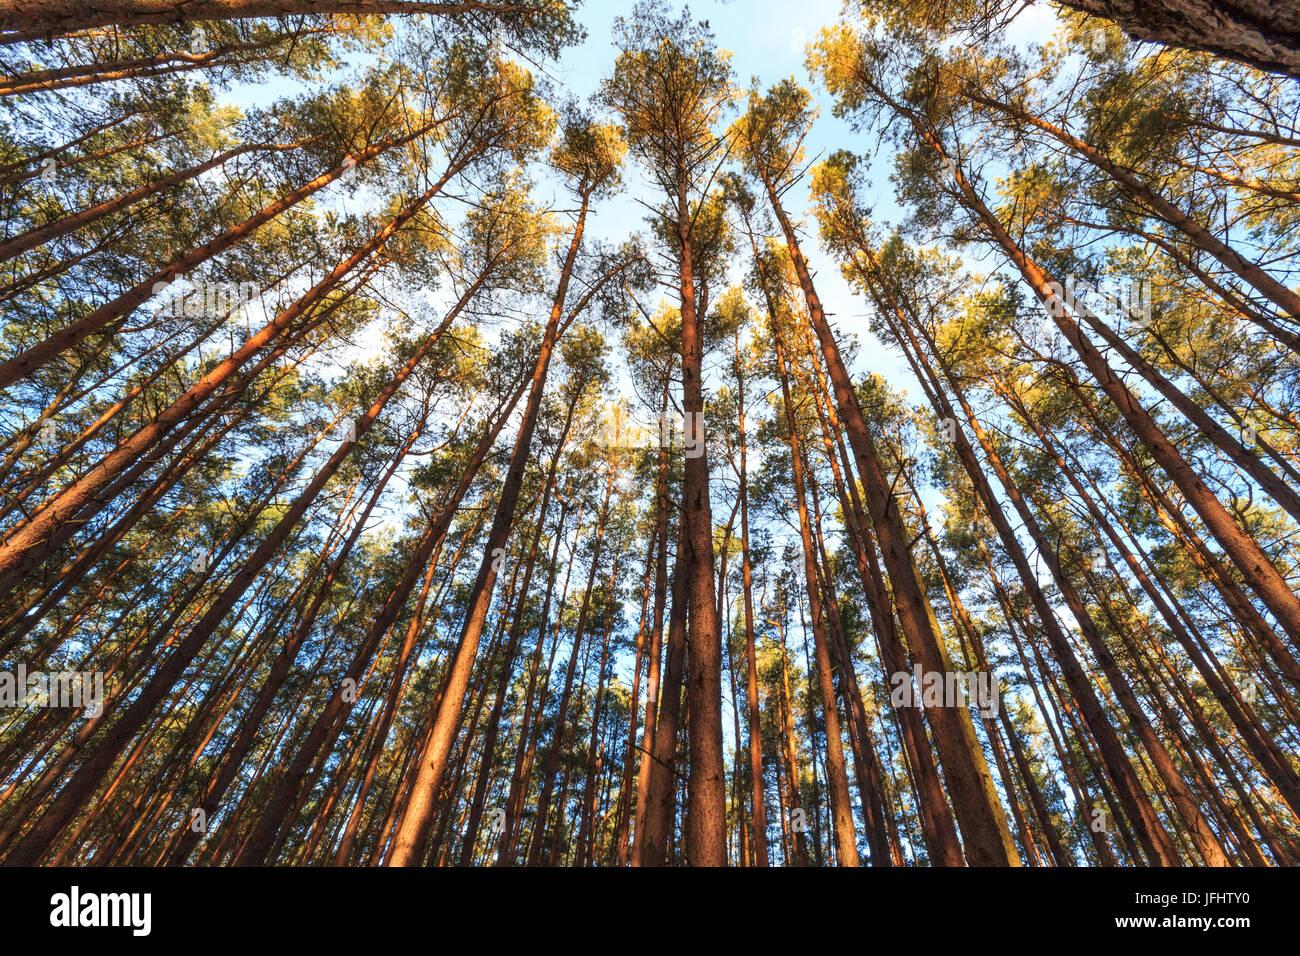 Bäume/Baumkronen im Wald Stockbild